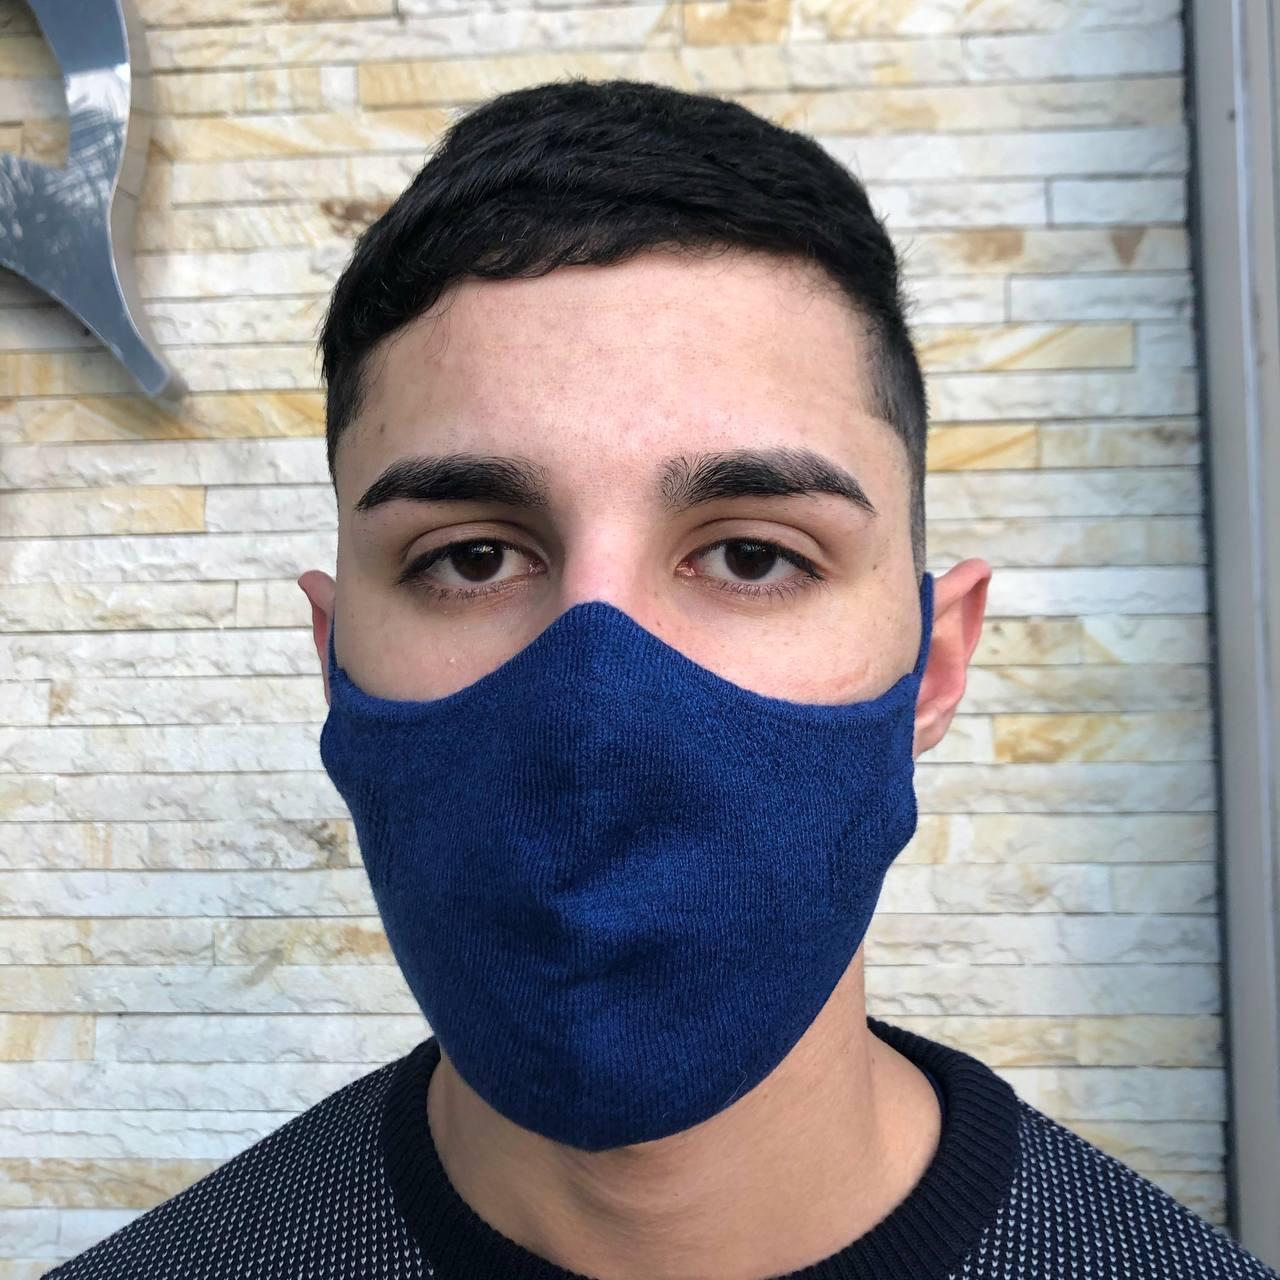 MÁSCARA TRADICIONAL  DON CARLI 3D KNITTING